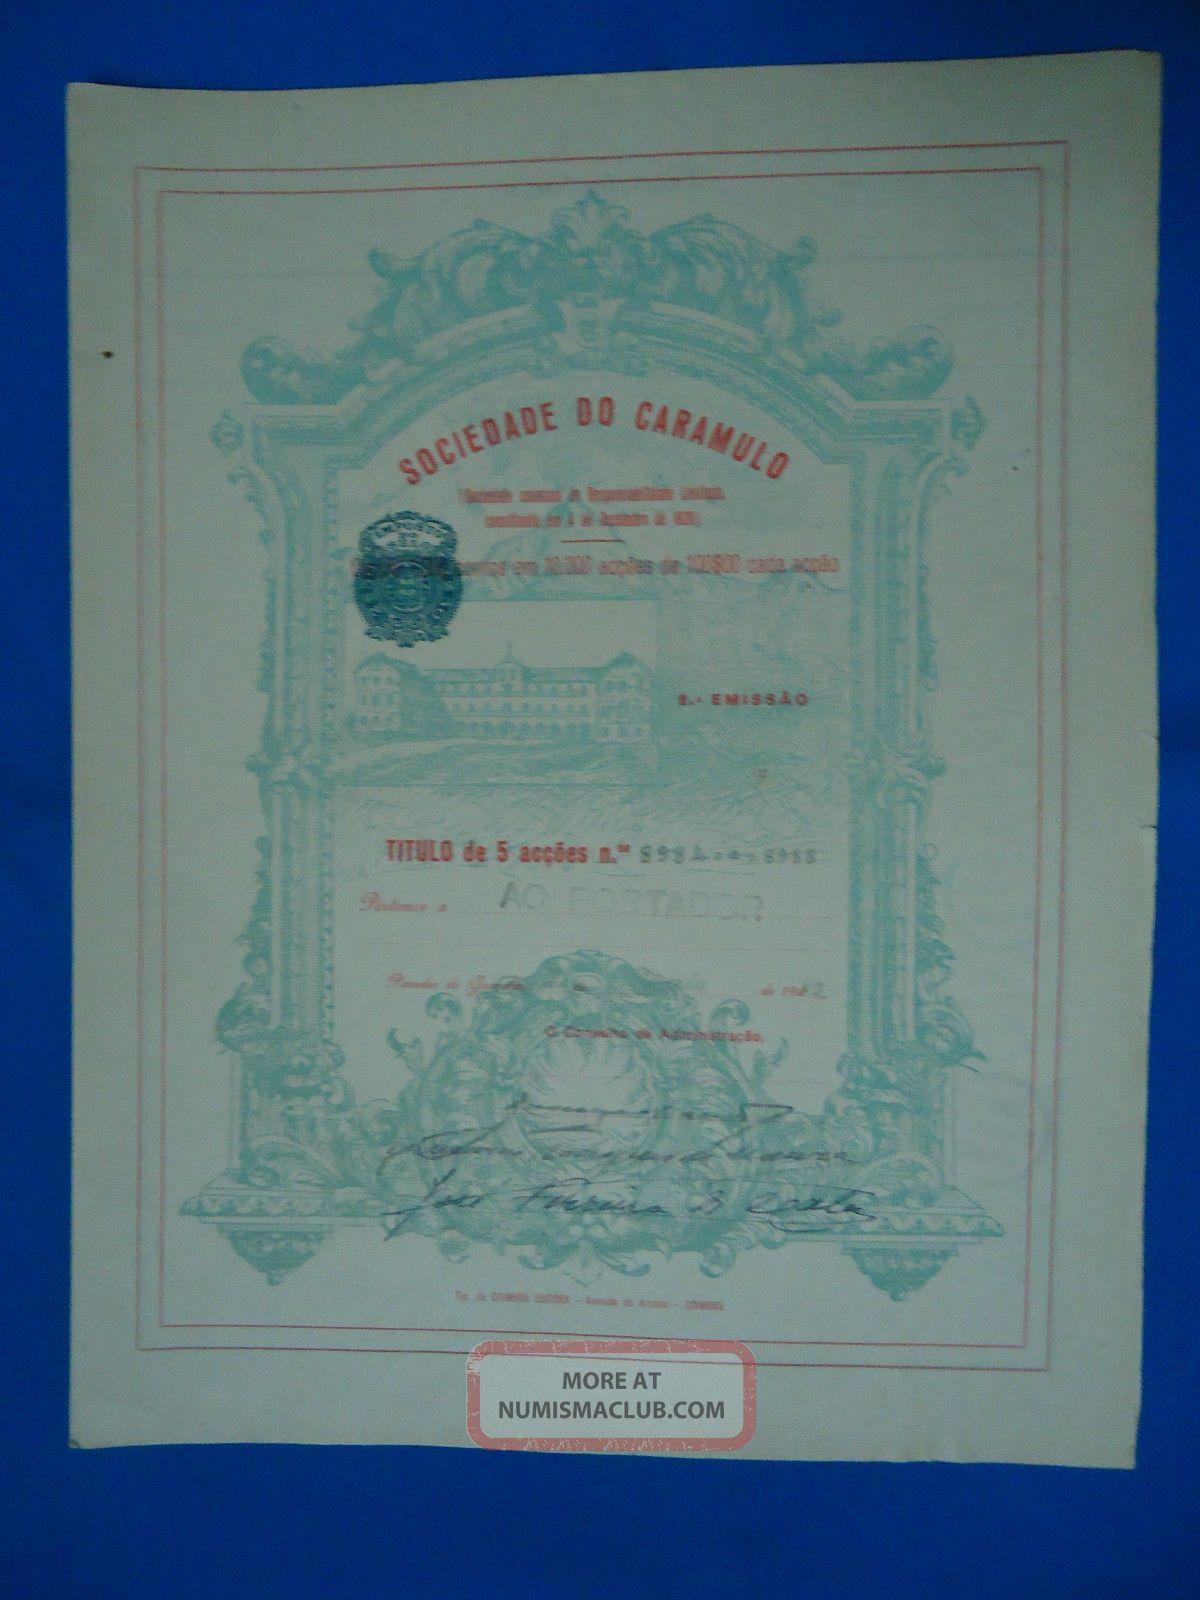 Portugal Share Sociedade Do Caramulo 500 Escudos 1932 Look Scans World photo